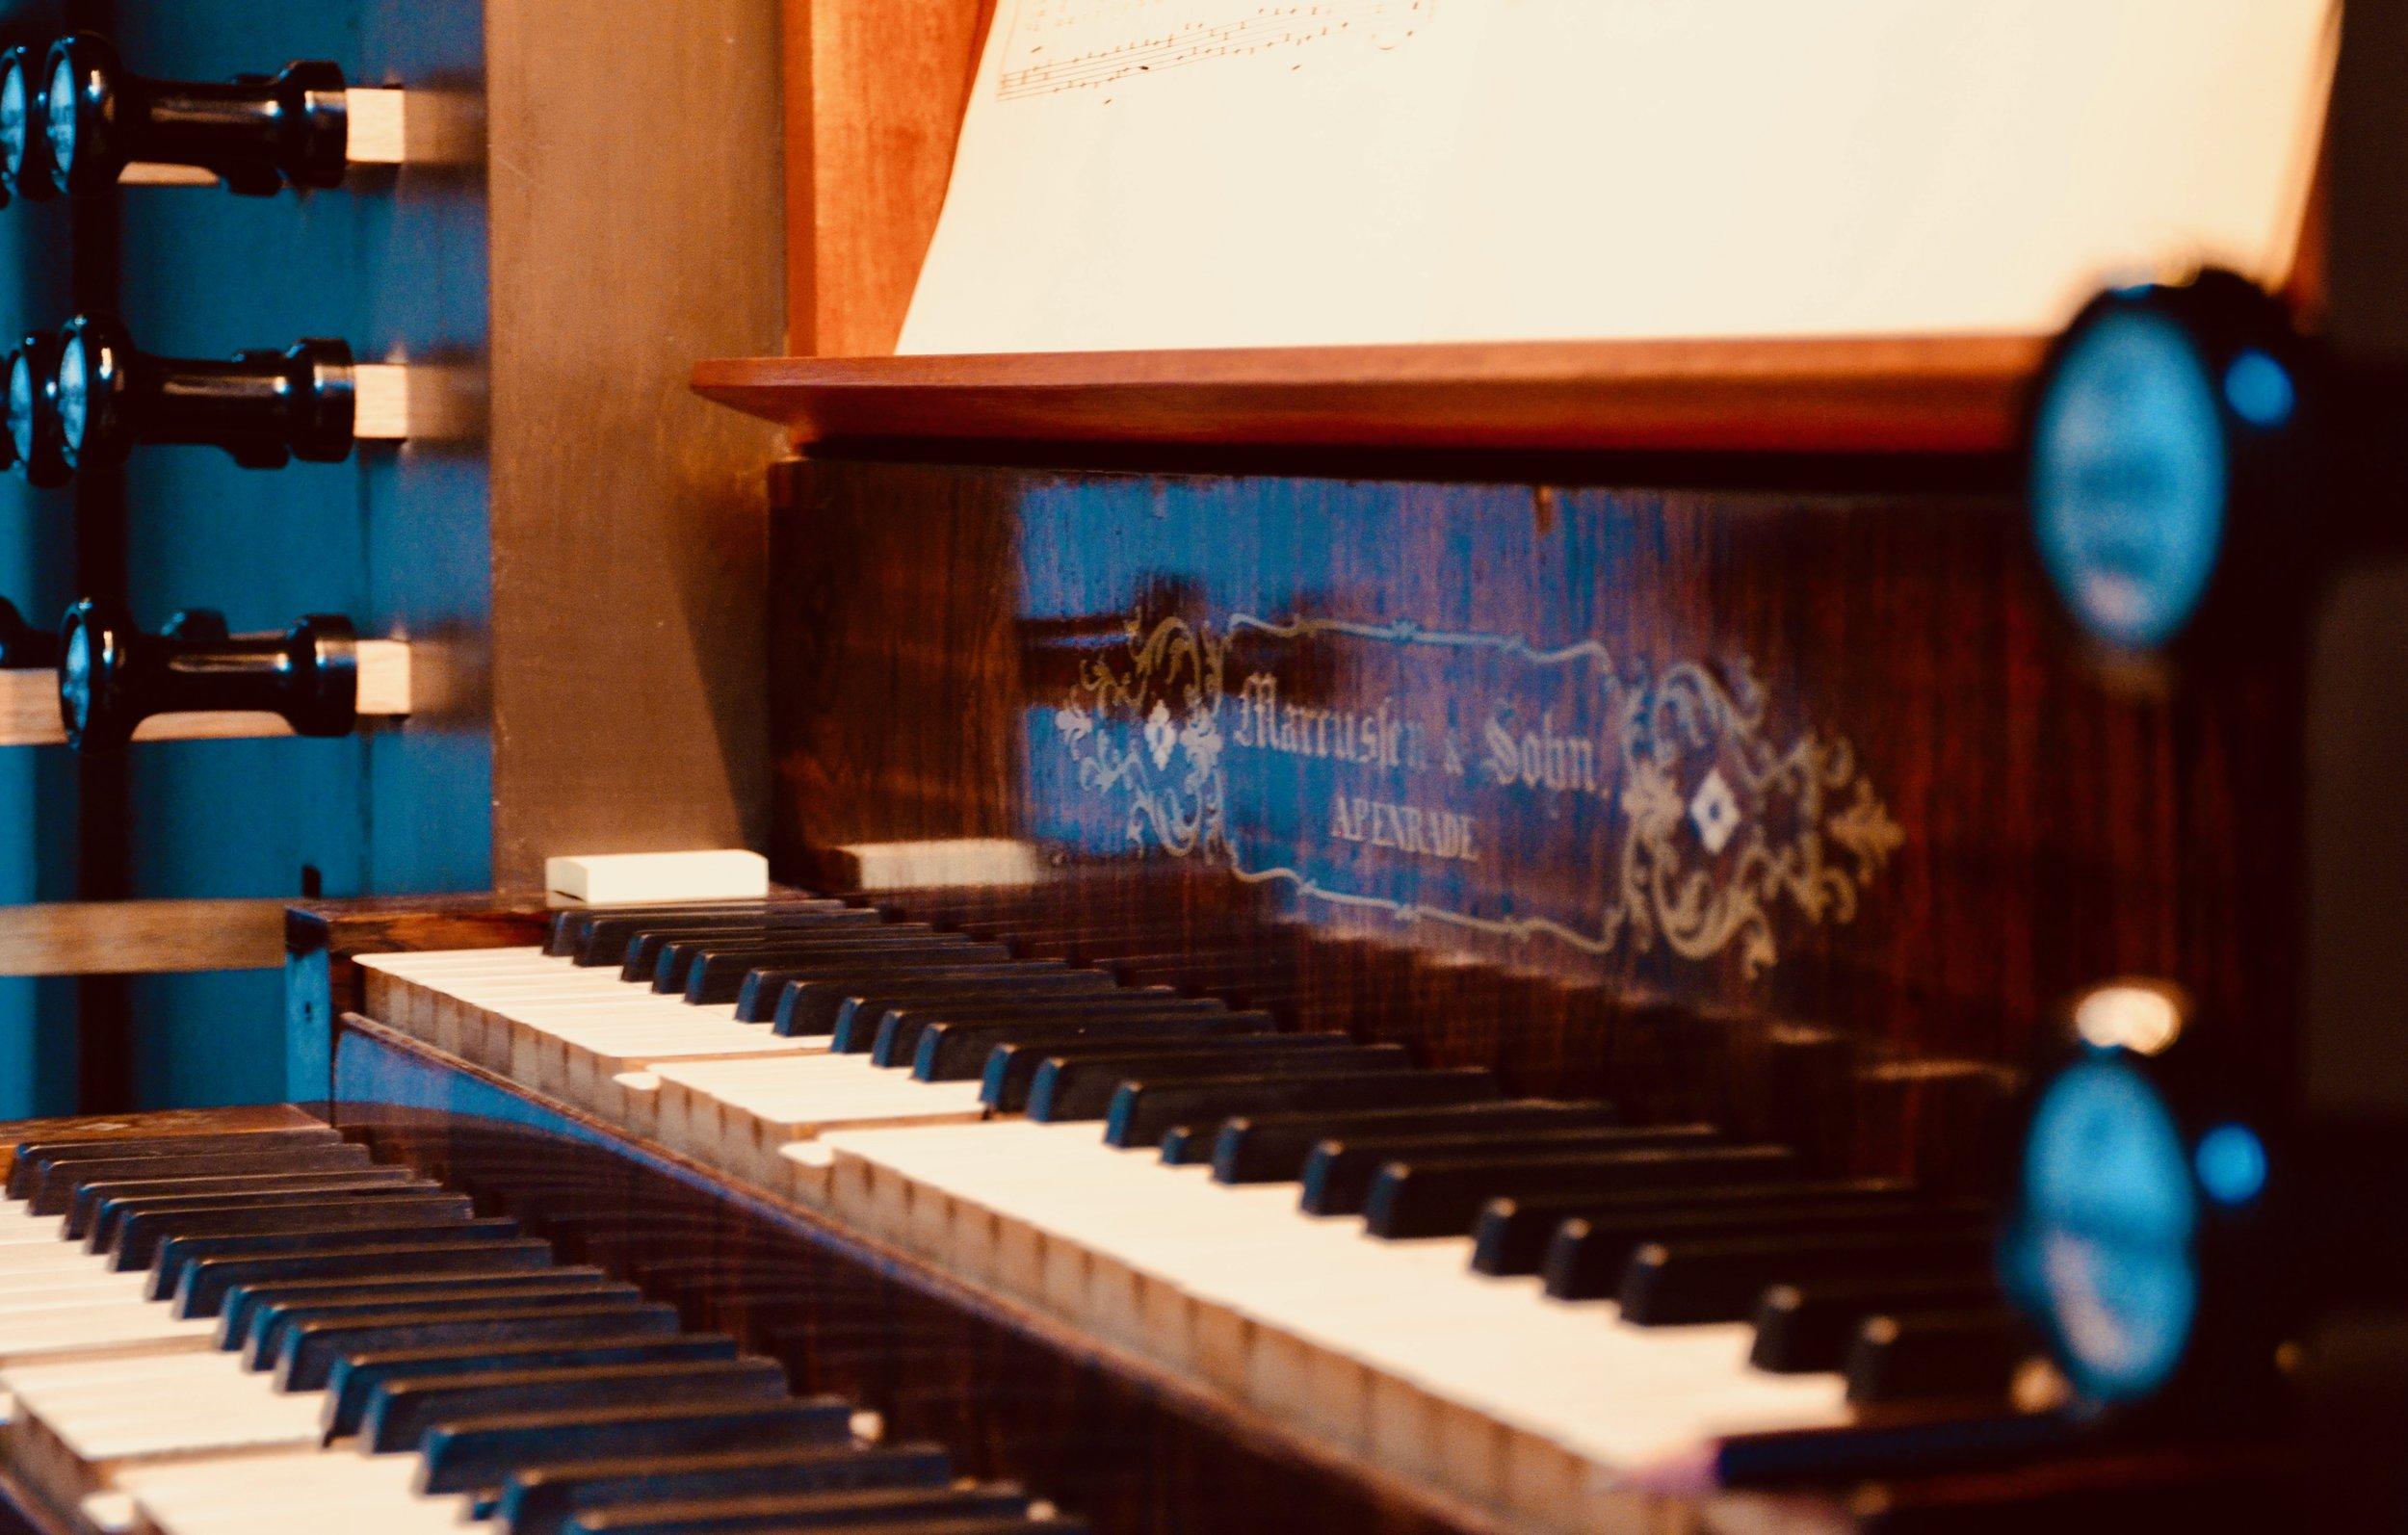 Console detail, 1861 Marcussen & Søn organ in Haga Church, Göteborg, Sweden.